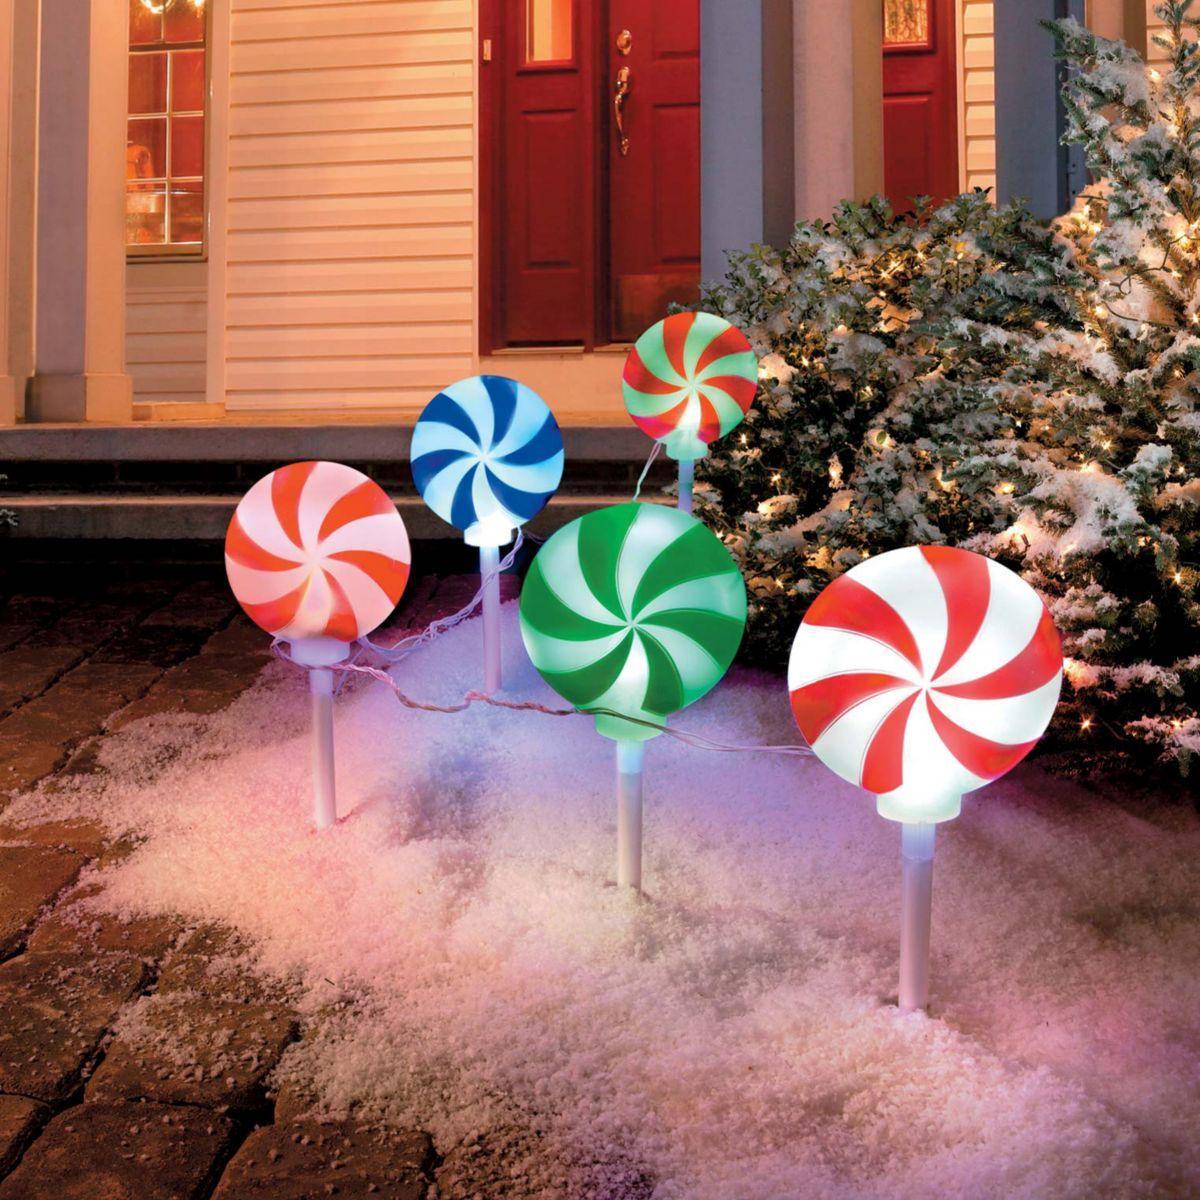 Peppermint Christmas Pathway Lights | xmas village | Pinterest ...